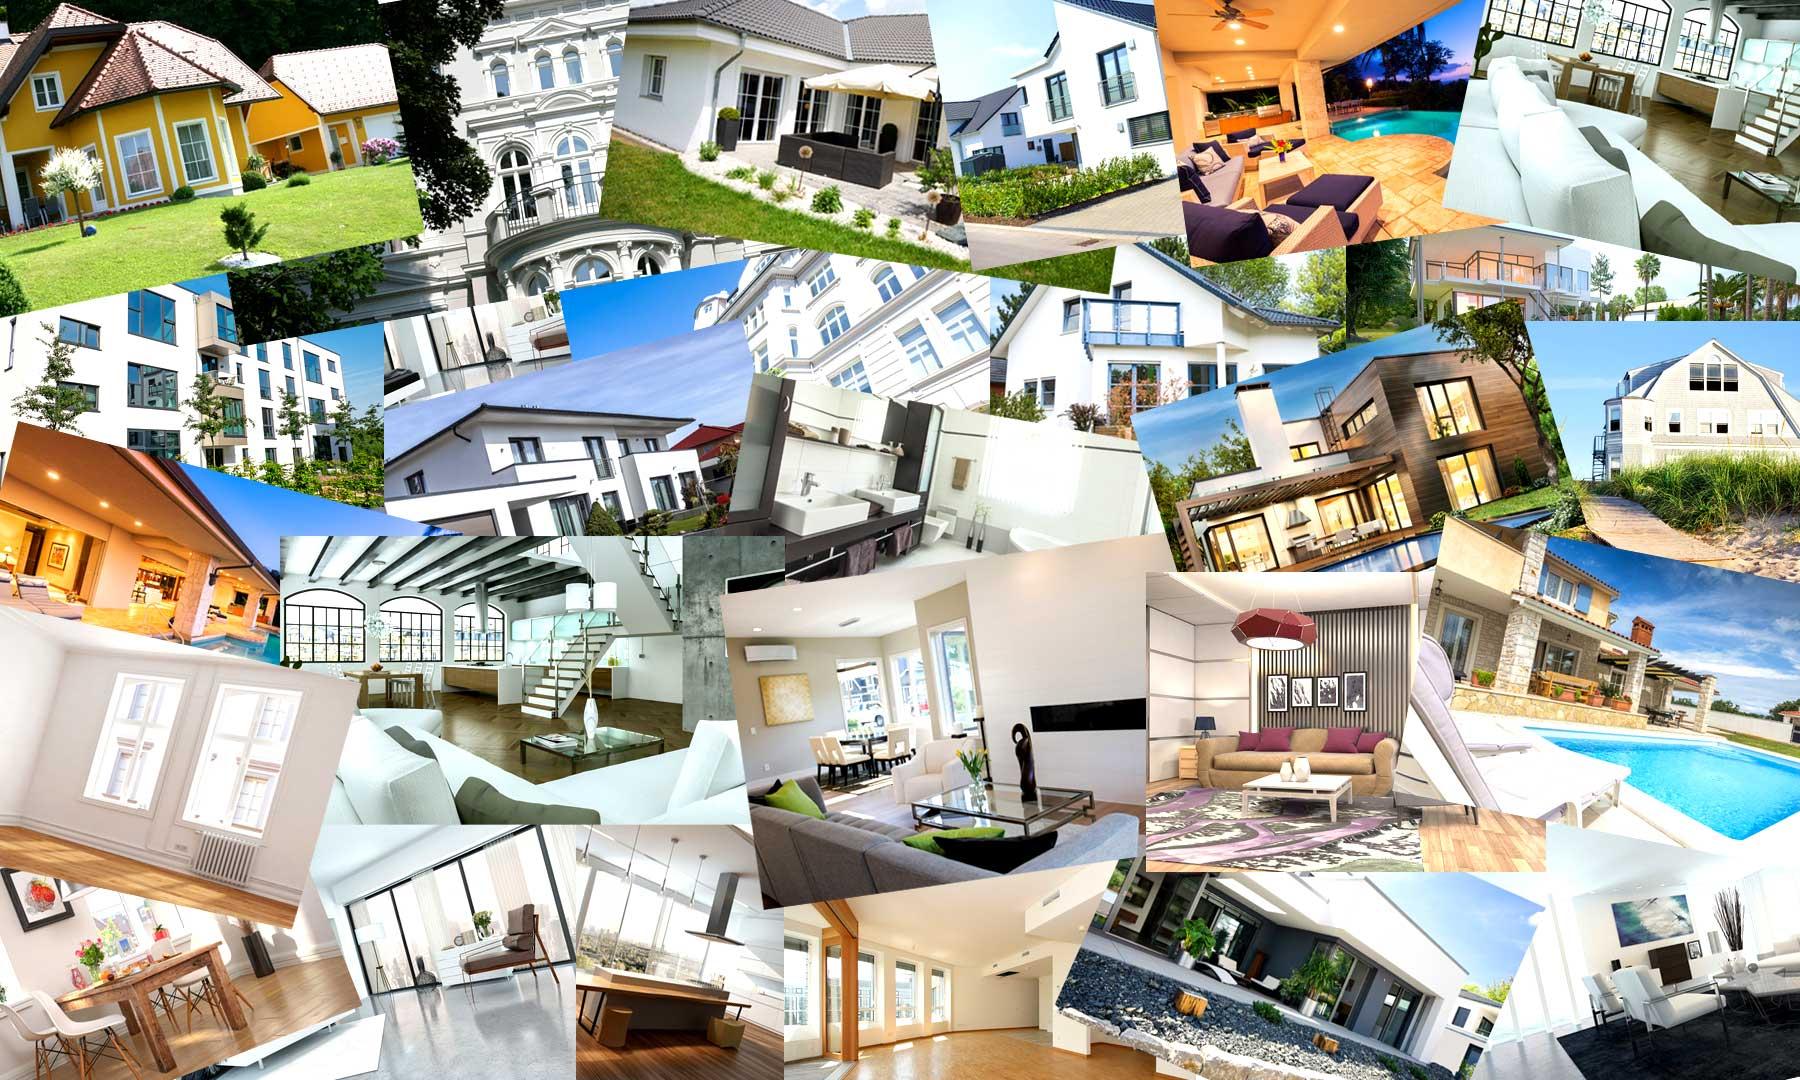 maklerempfehlung torsten na hanseatische immobilien. Black Bedroom Furniture Sets. Home Design Ideas